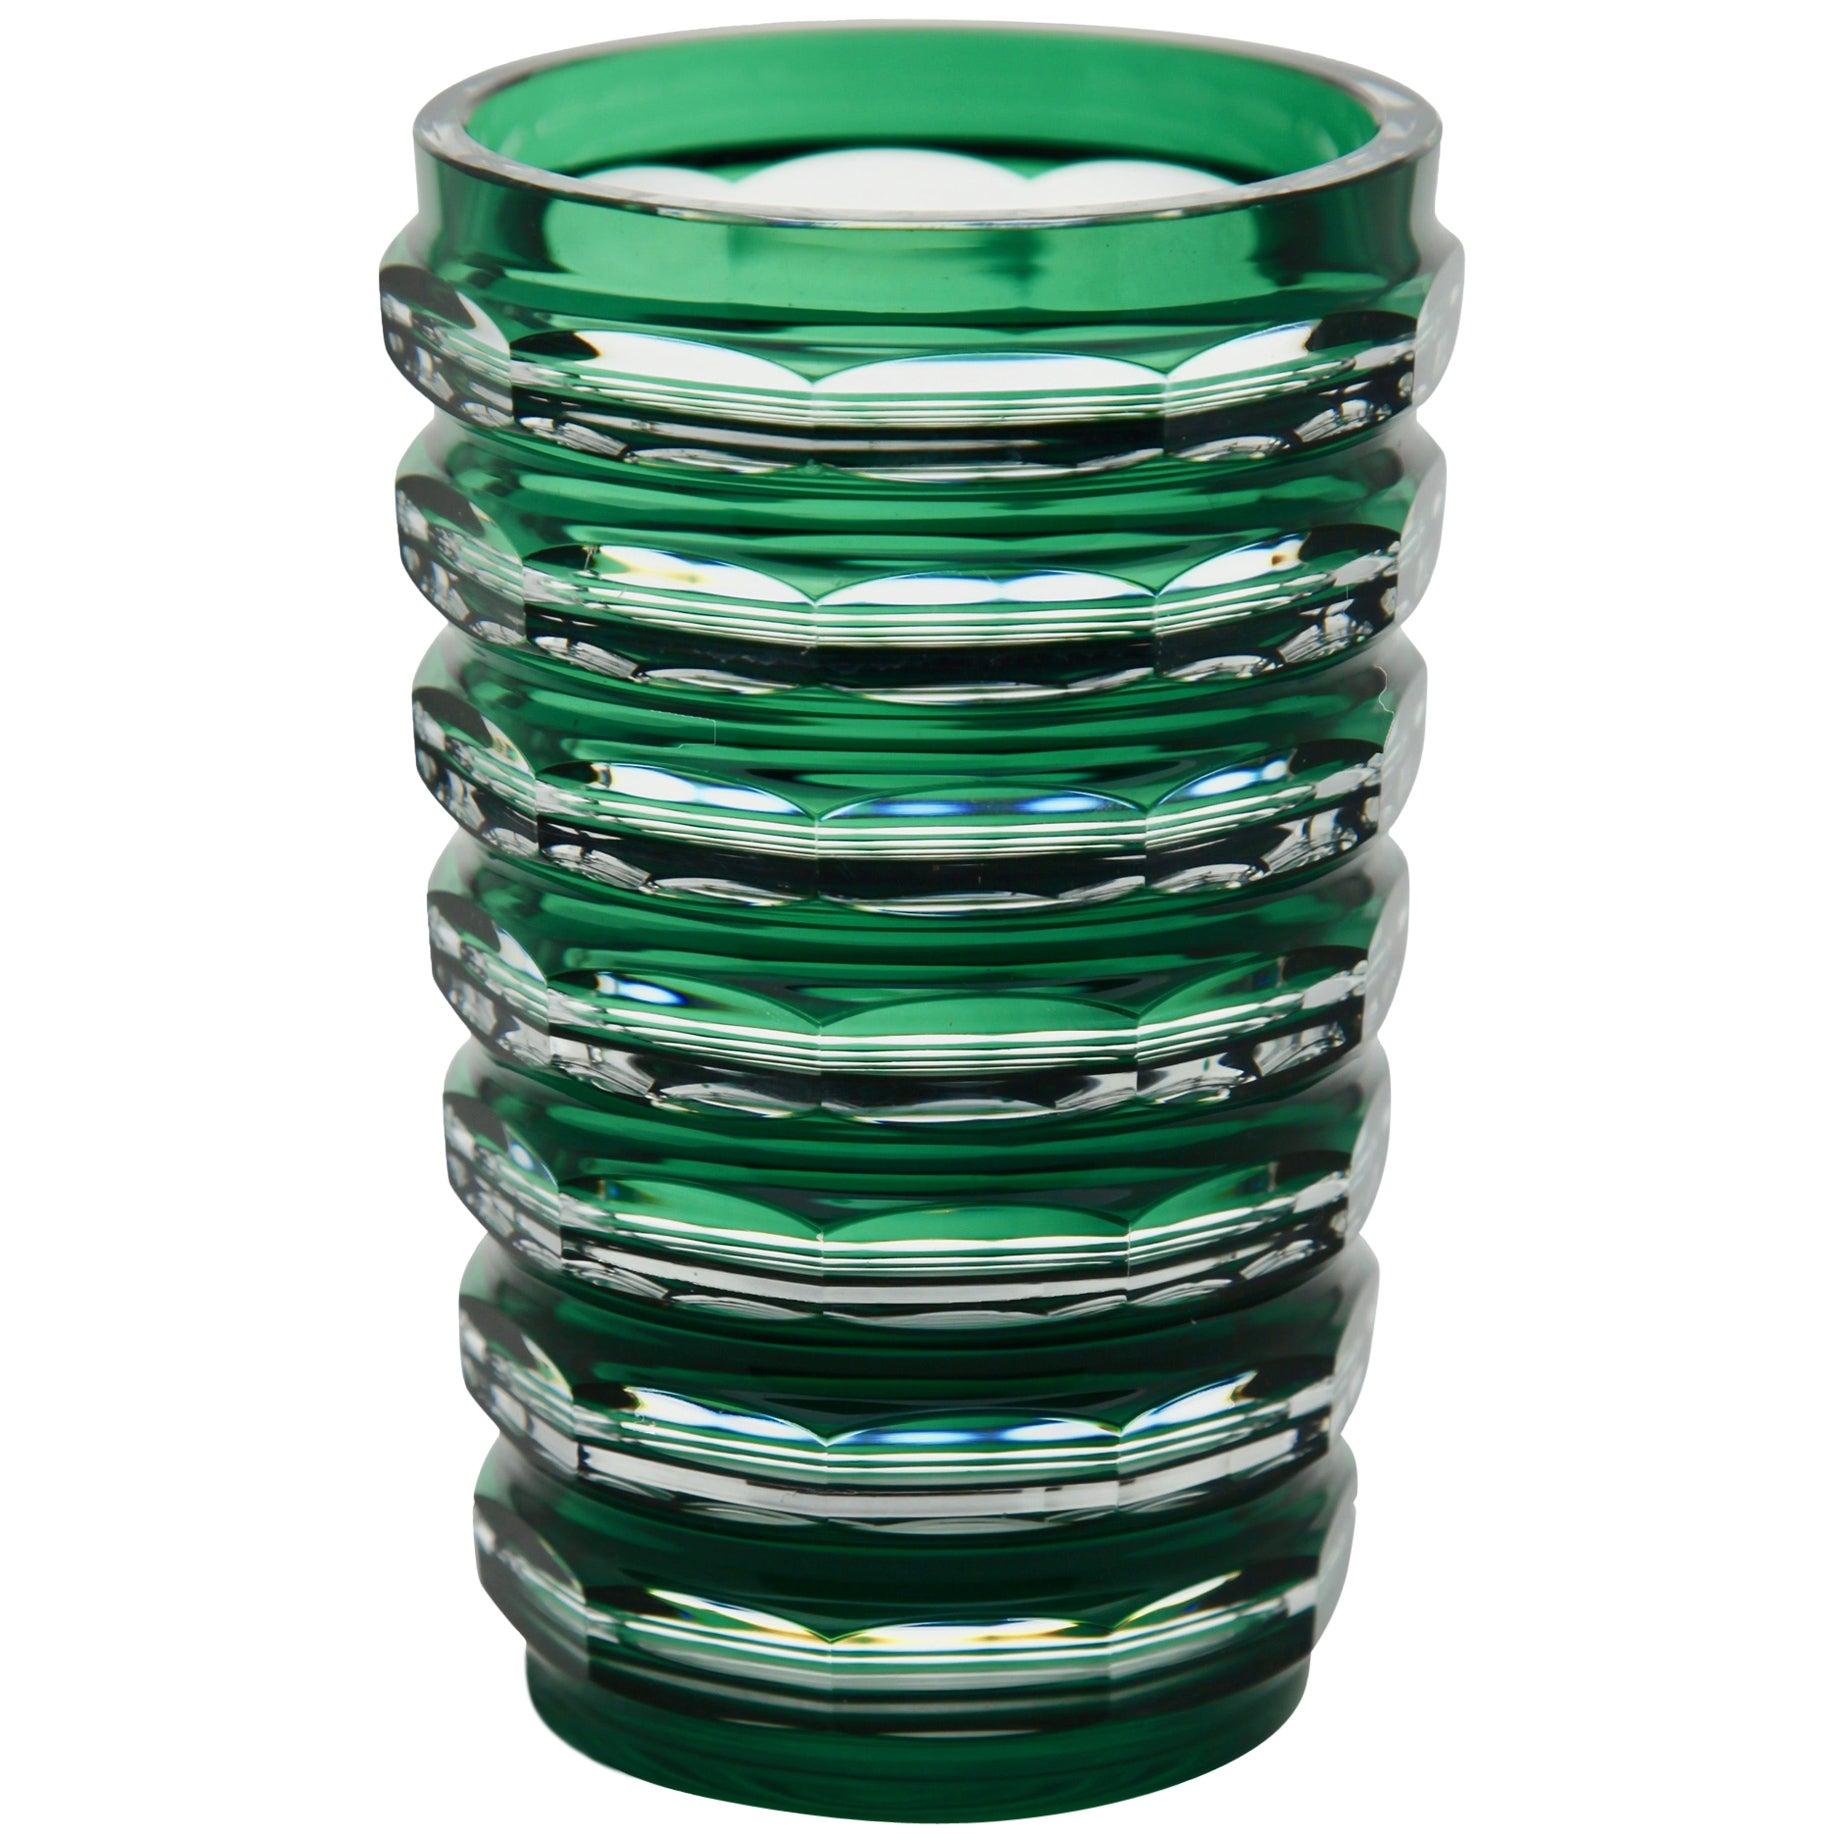 Val Saint Lambert Crystal Vase Cut-to-Clear, 1950s